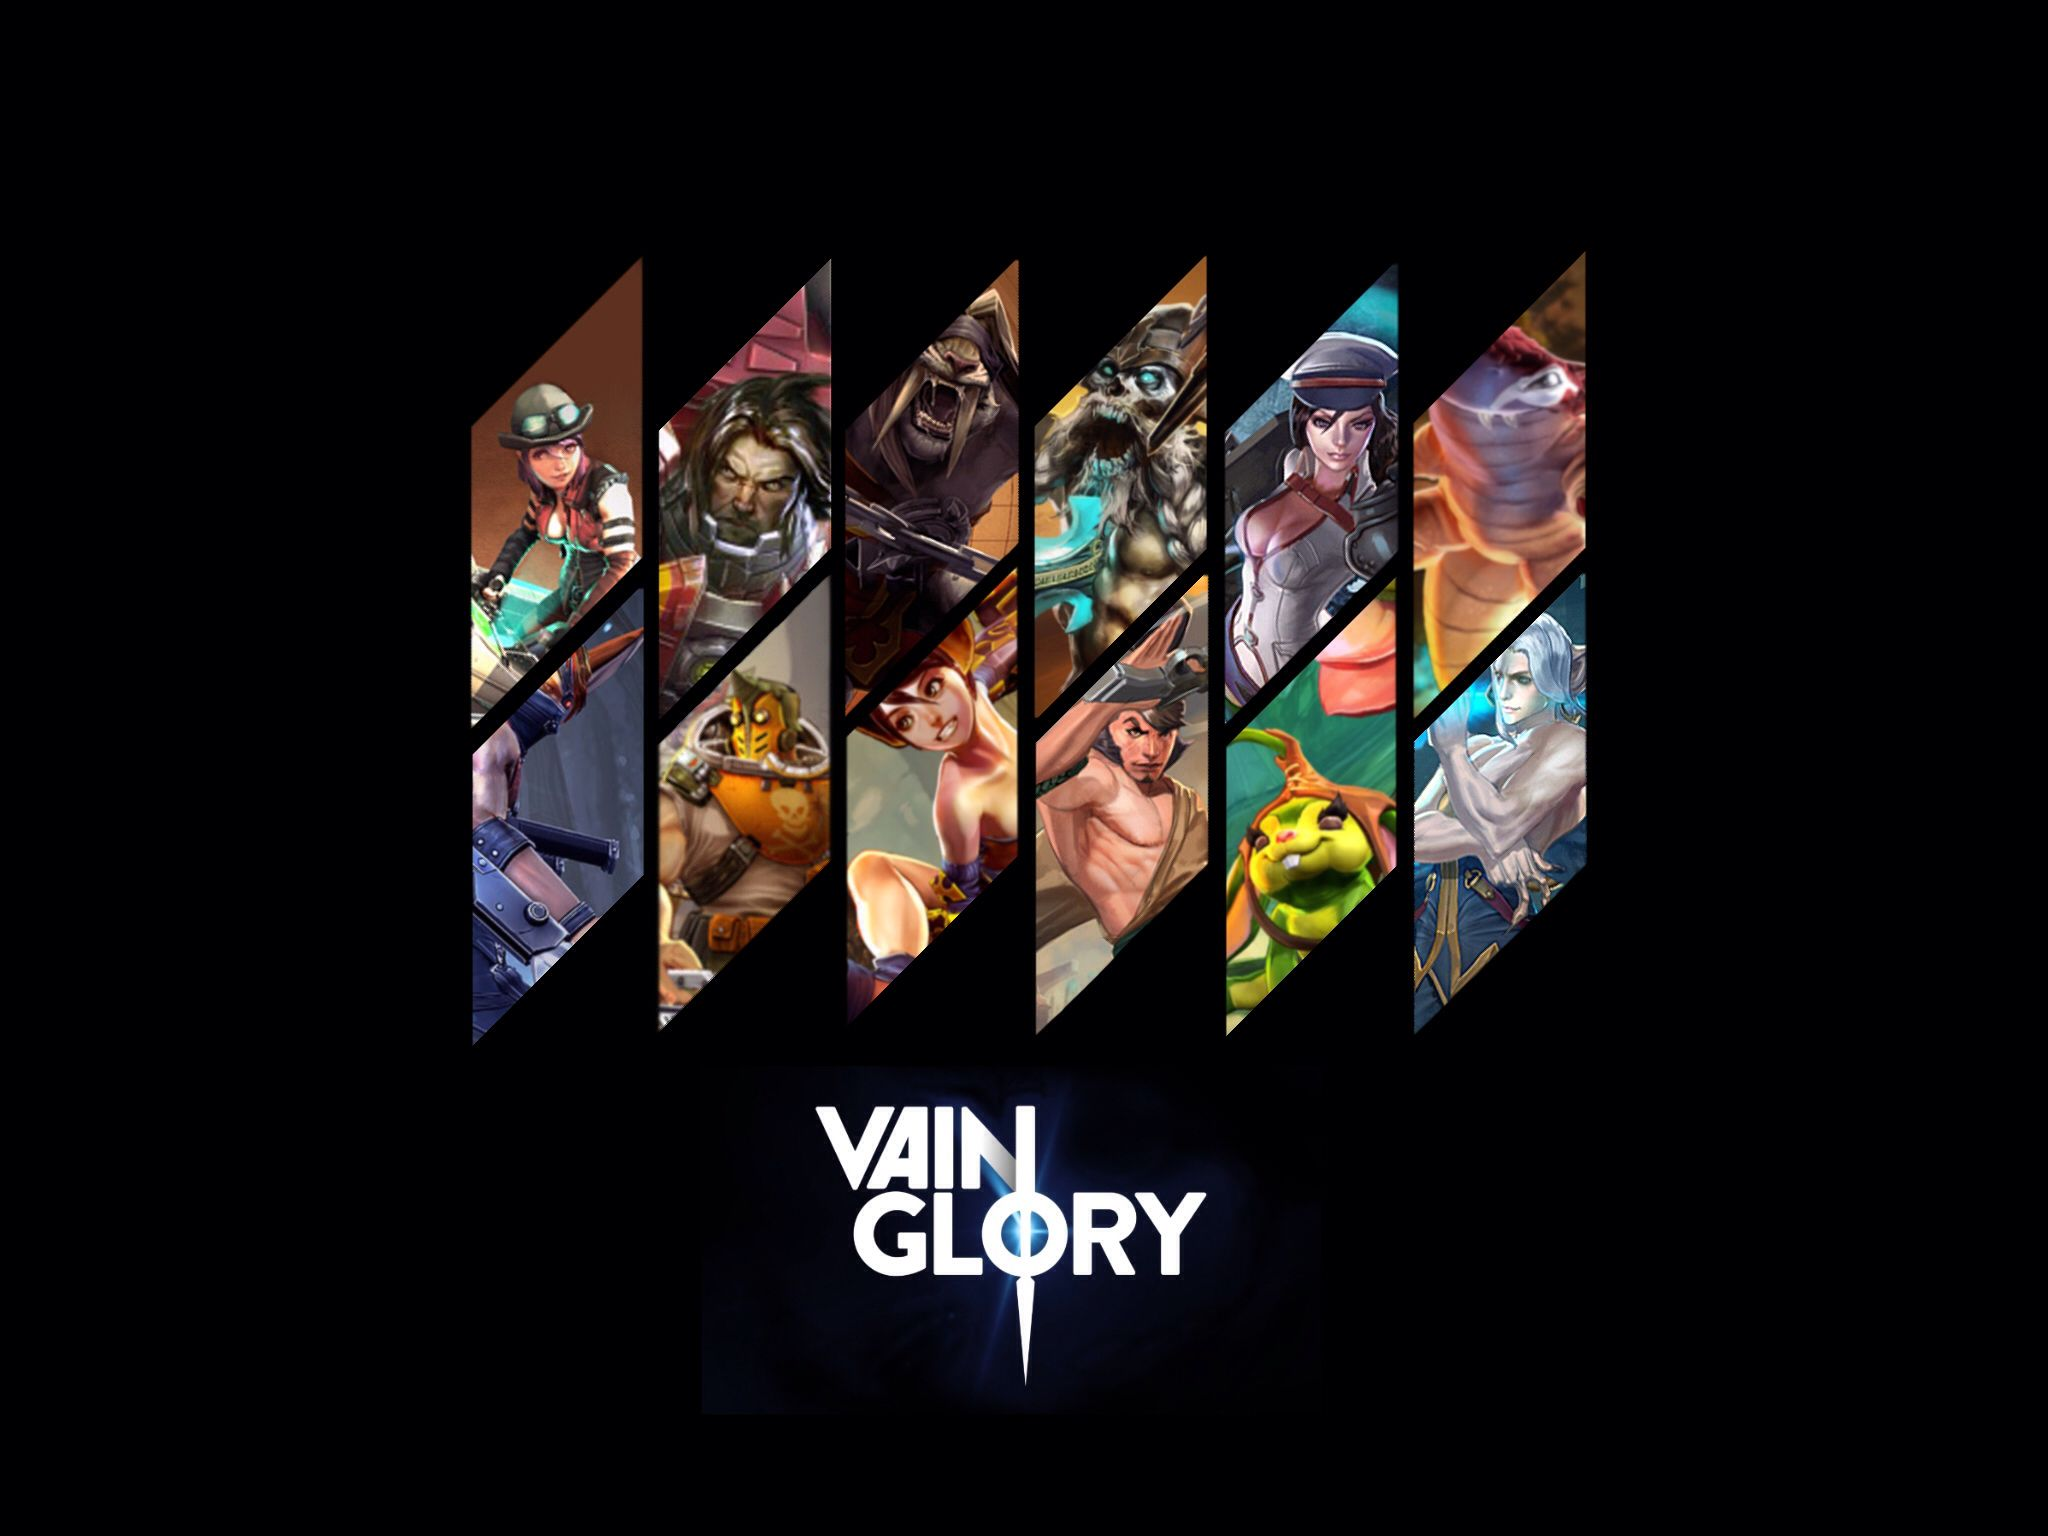 Download 400 Wallpaper Hd Vainglory